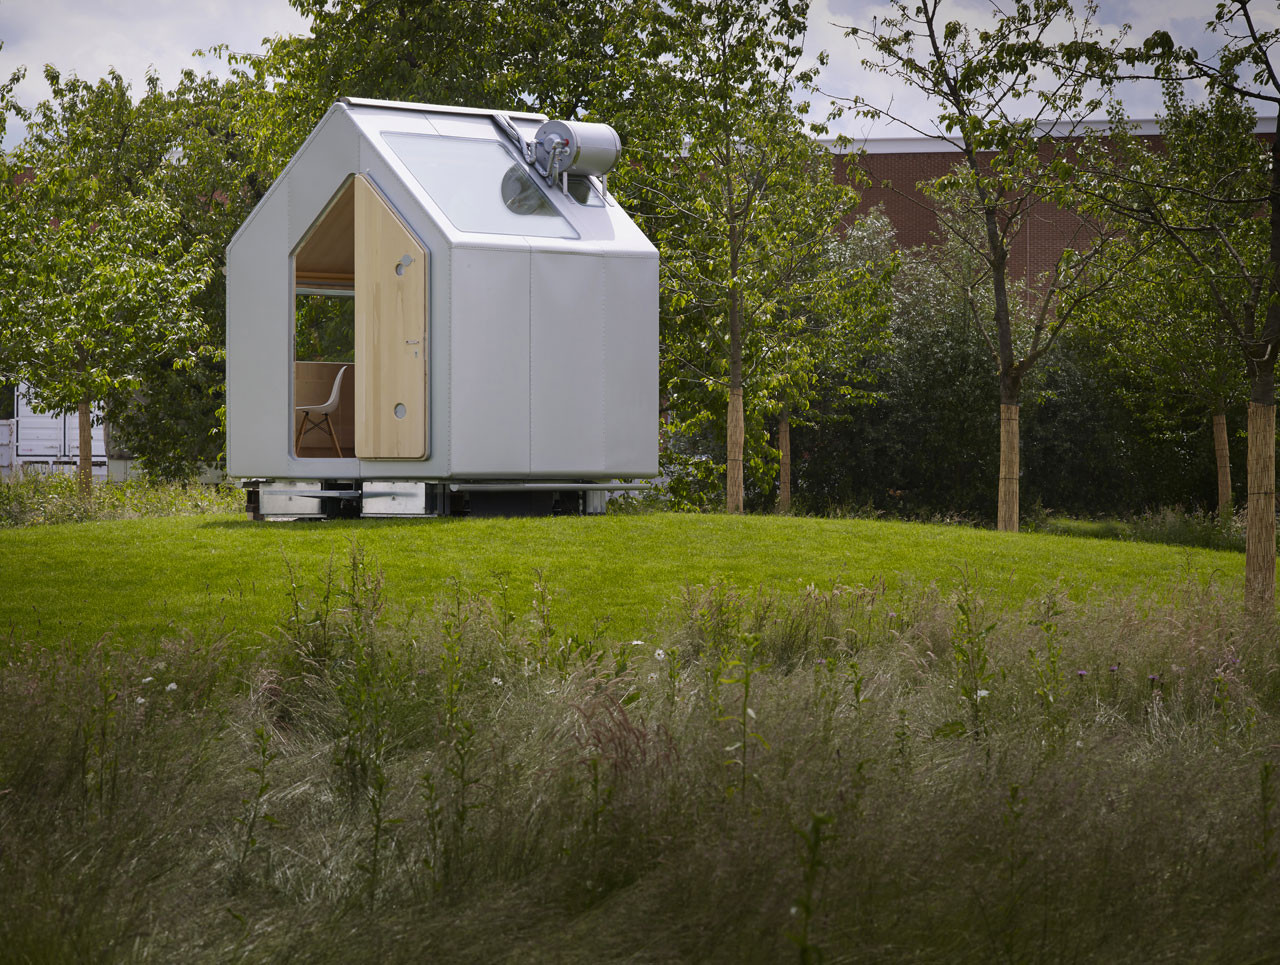 Renzo Piano presenta Diogene: una cabina auto-suficiente y desarmable para una persona, © Renzo Piano / Vitra